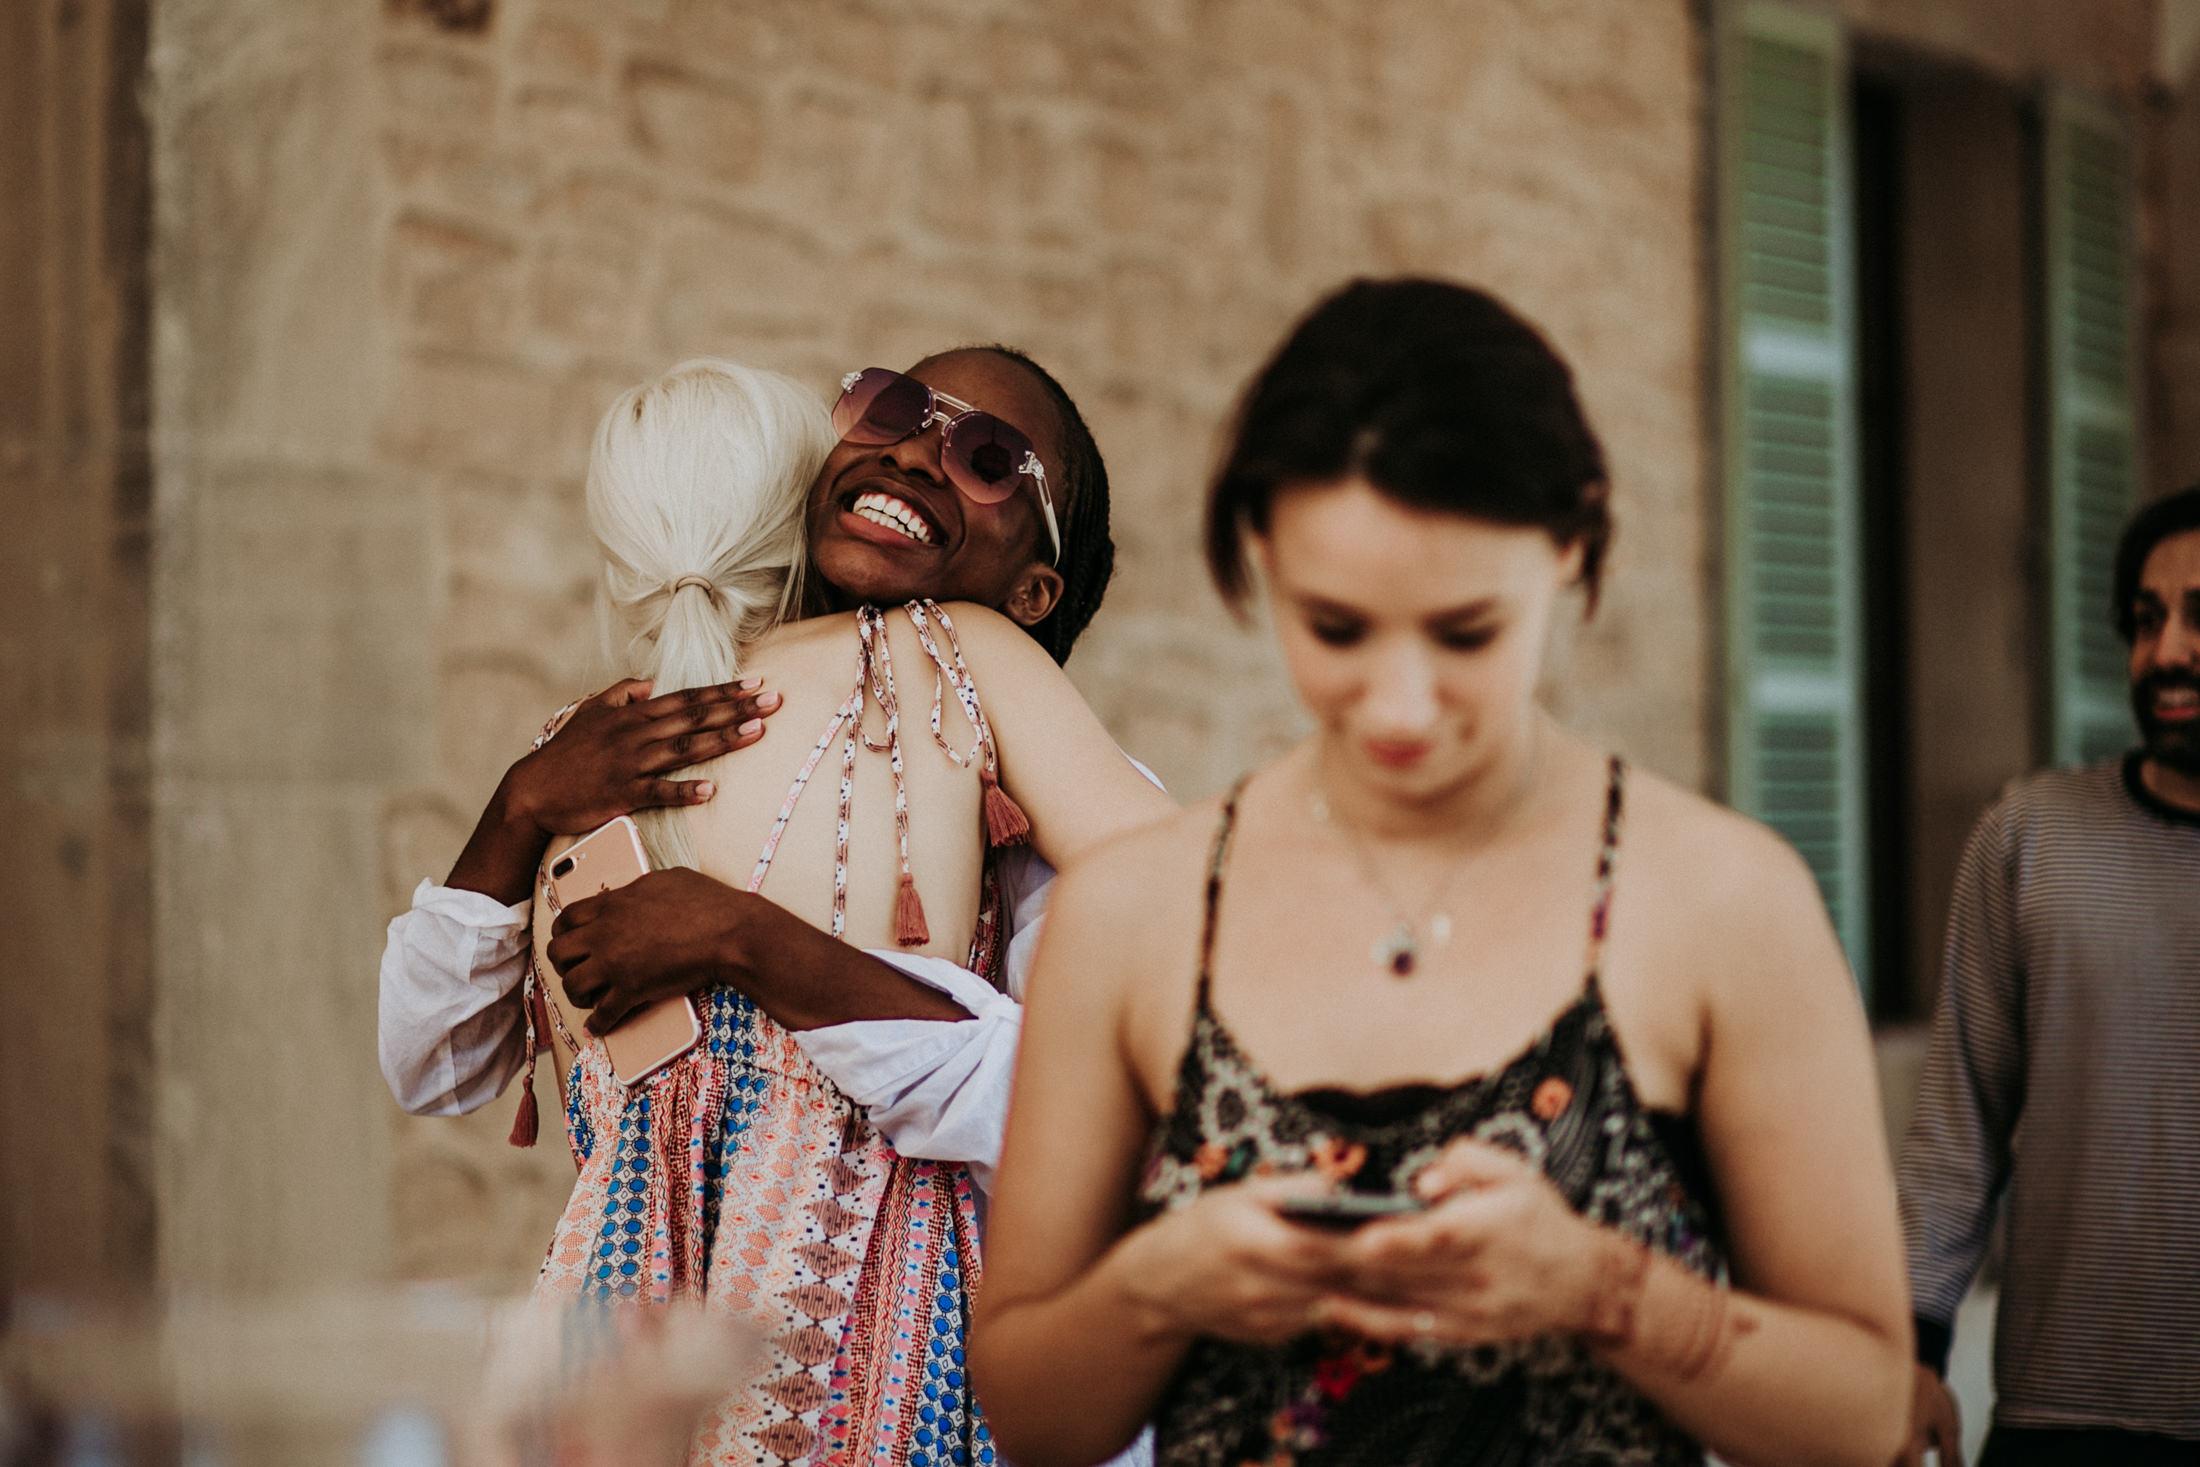 Wedding_Photographer_Mallorca_Daniela-Marquardt_Photography_New_York_Iceland_Tuscany_Santorini_Portugal_Austria_Bavaria_Elopement_Hochzeitsfotograf_AntjeRajat1_10